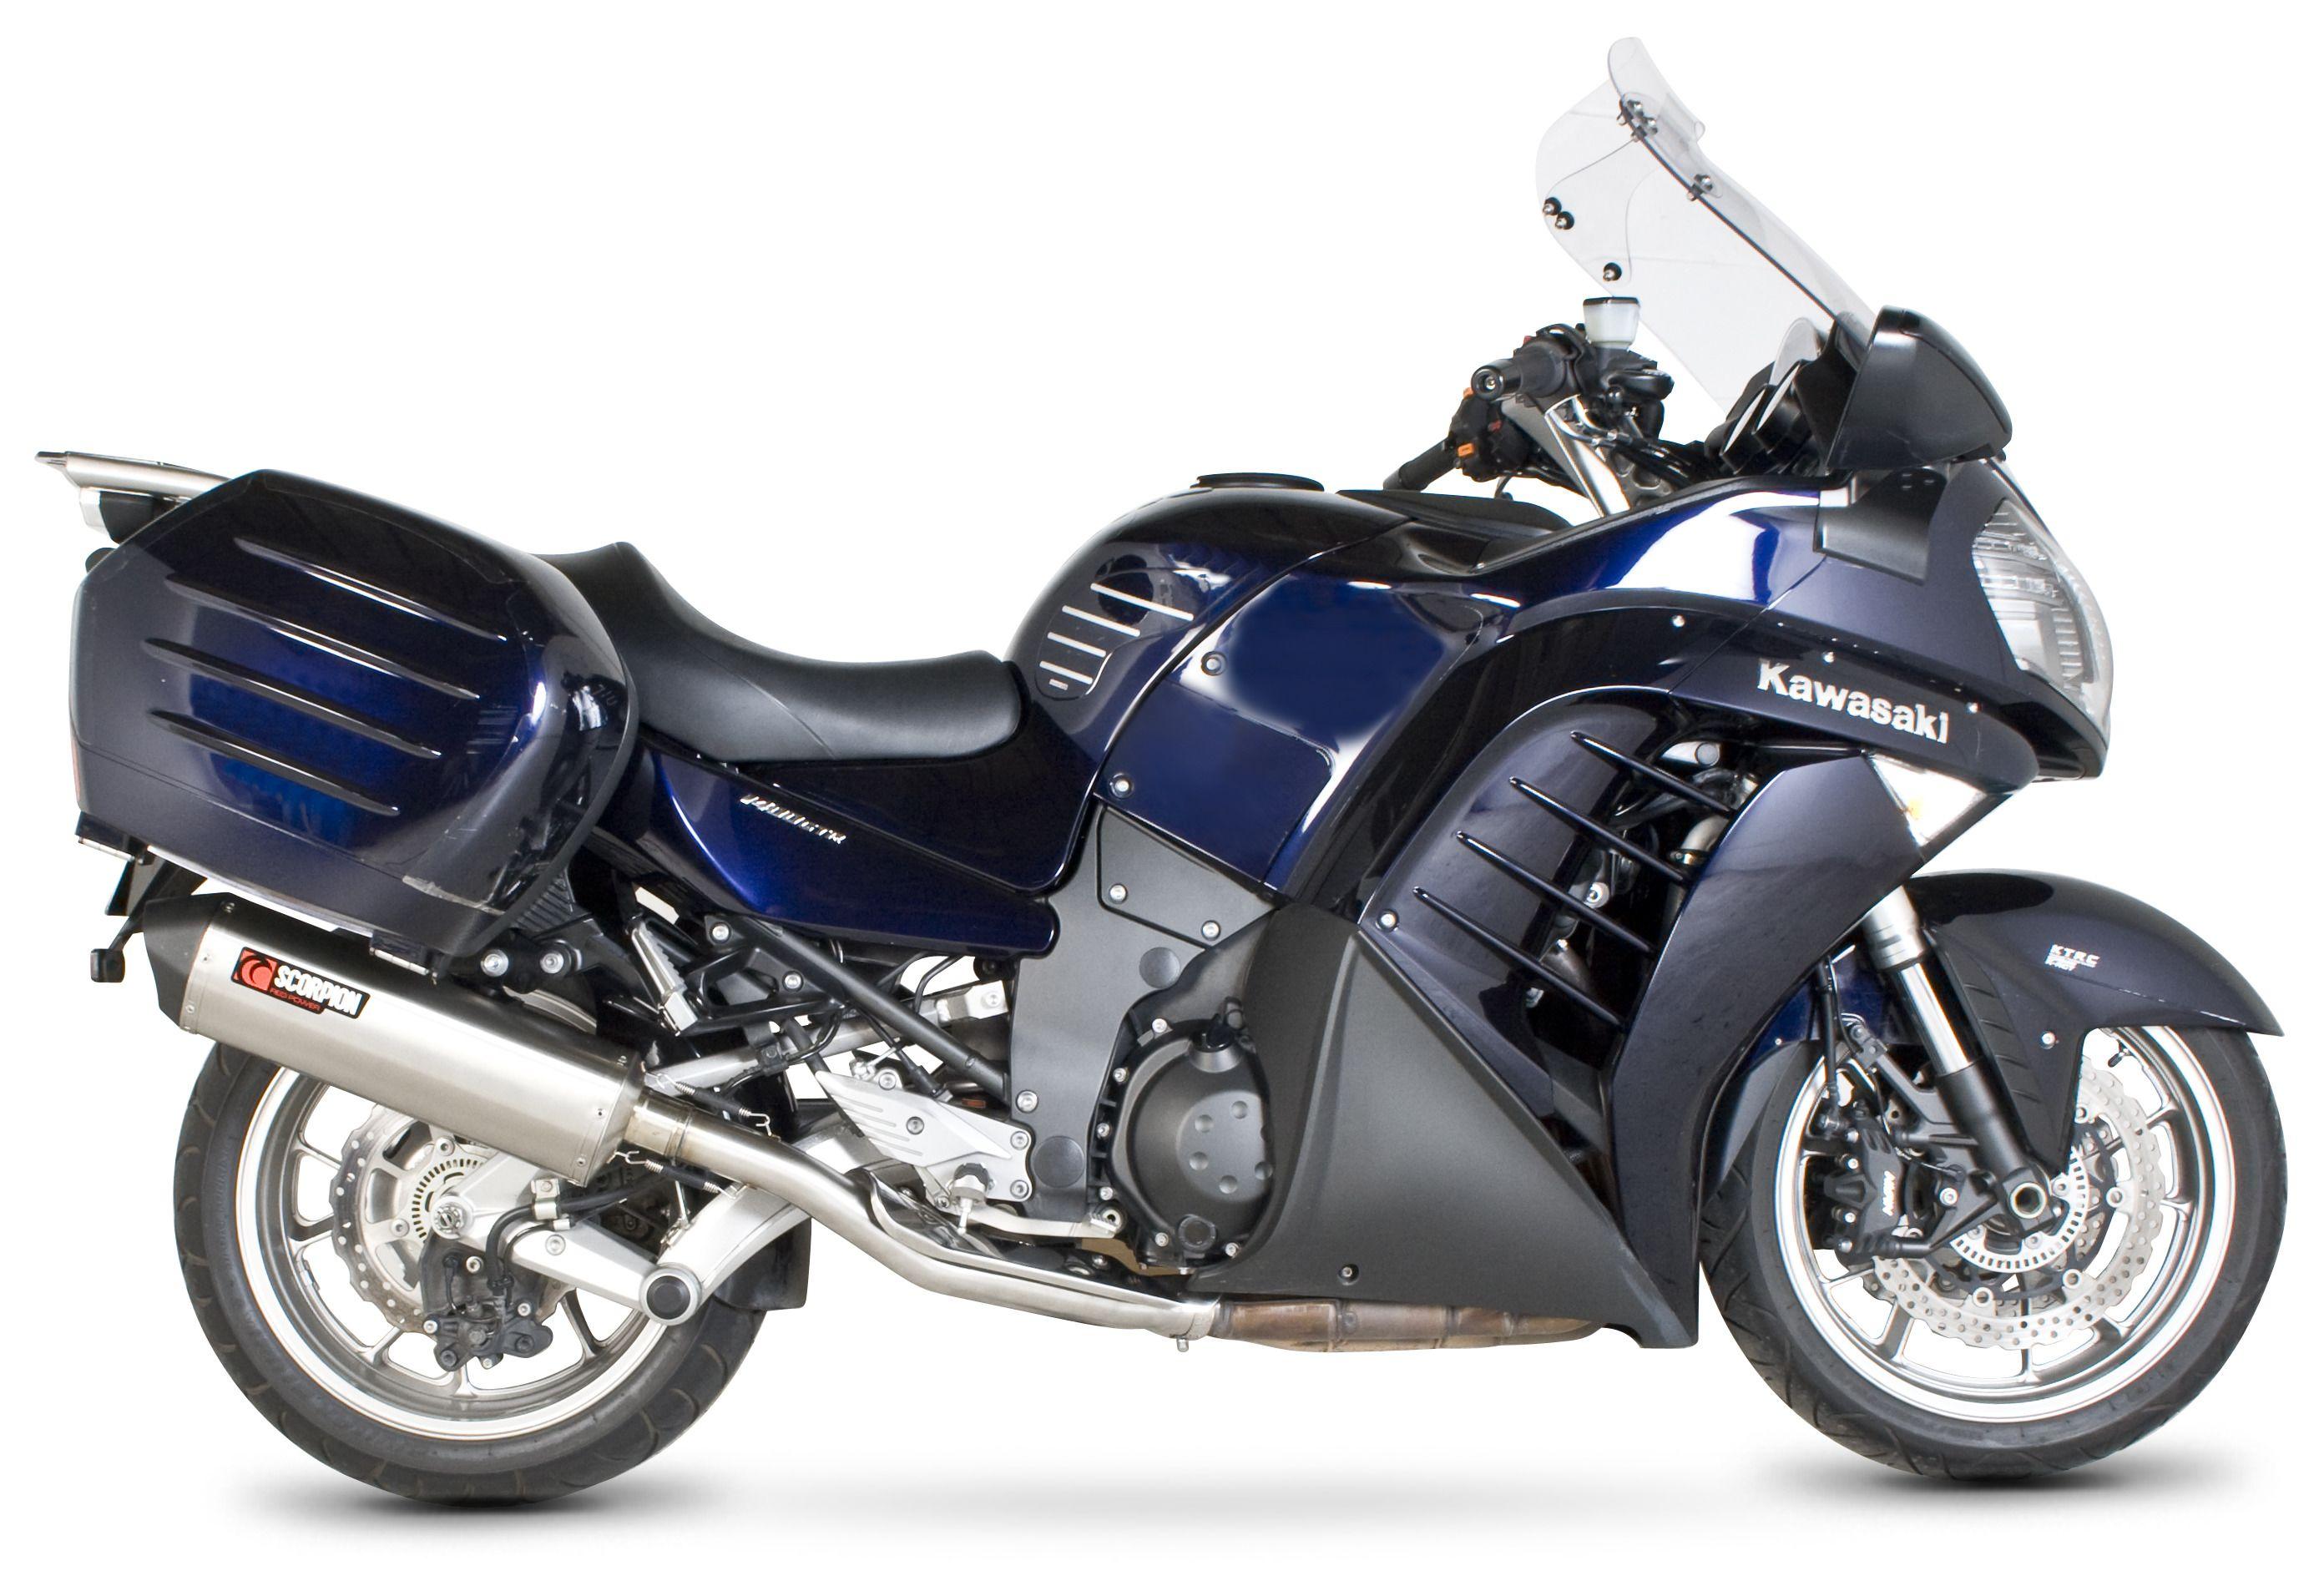 Scorpion Serket Parallel Slip-On Exhaust Kawasaki Concours 14 2007-2019 |  10% ($54 90) Off!